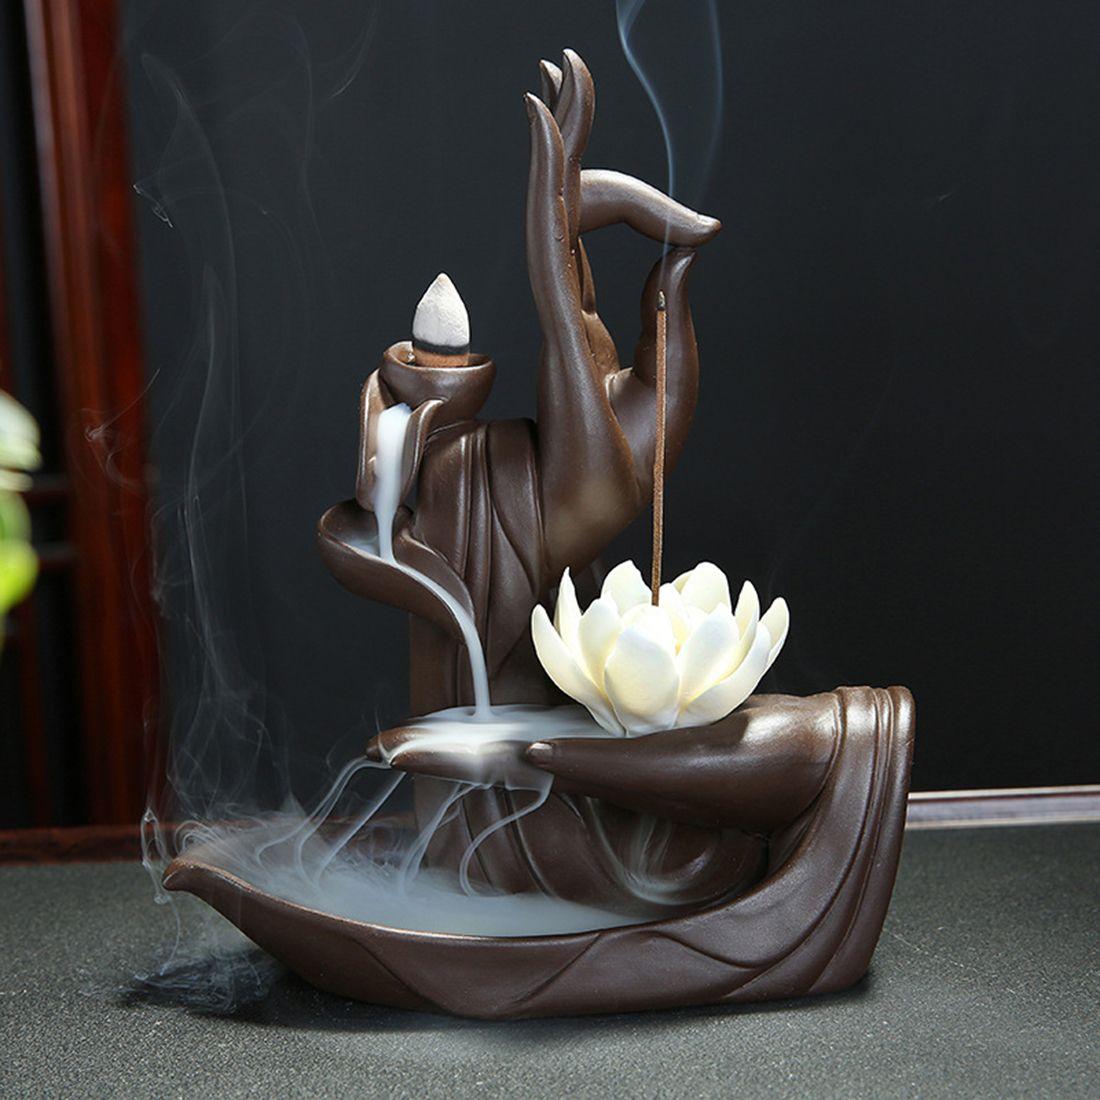 Ceramic Backflow Incense Burner Tathagata Buddha Lotus Incense Cones Stick Holder +10pc Cone Incense Creative Home Bouddha Decor